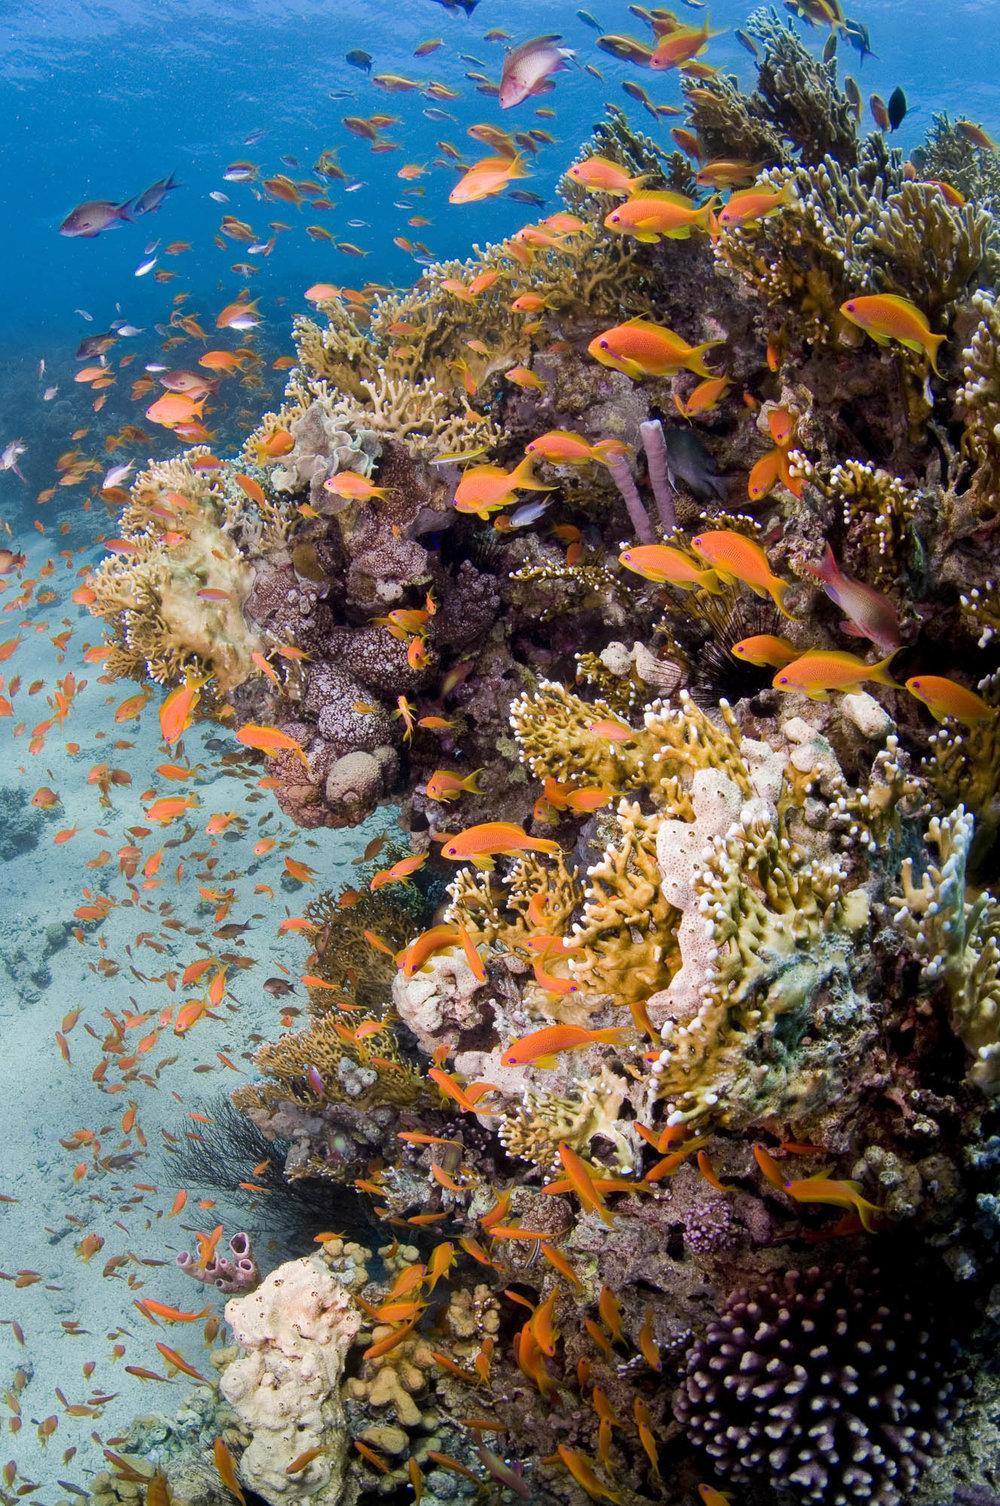 AQABA, JORDAN CREDIT: WARREN BAVERSTOCK/ coral reef image bank